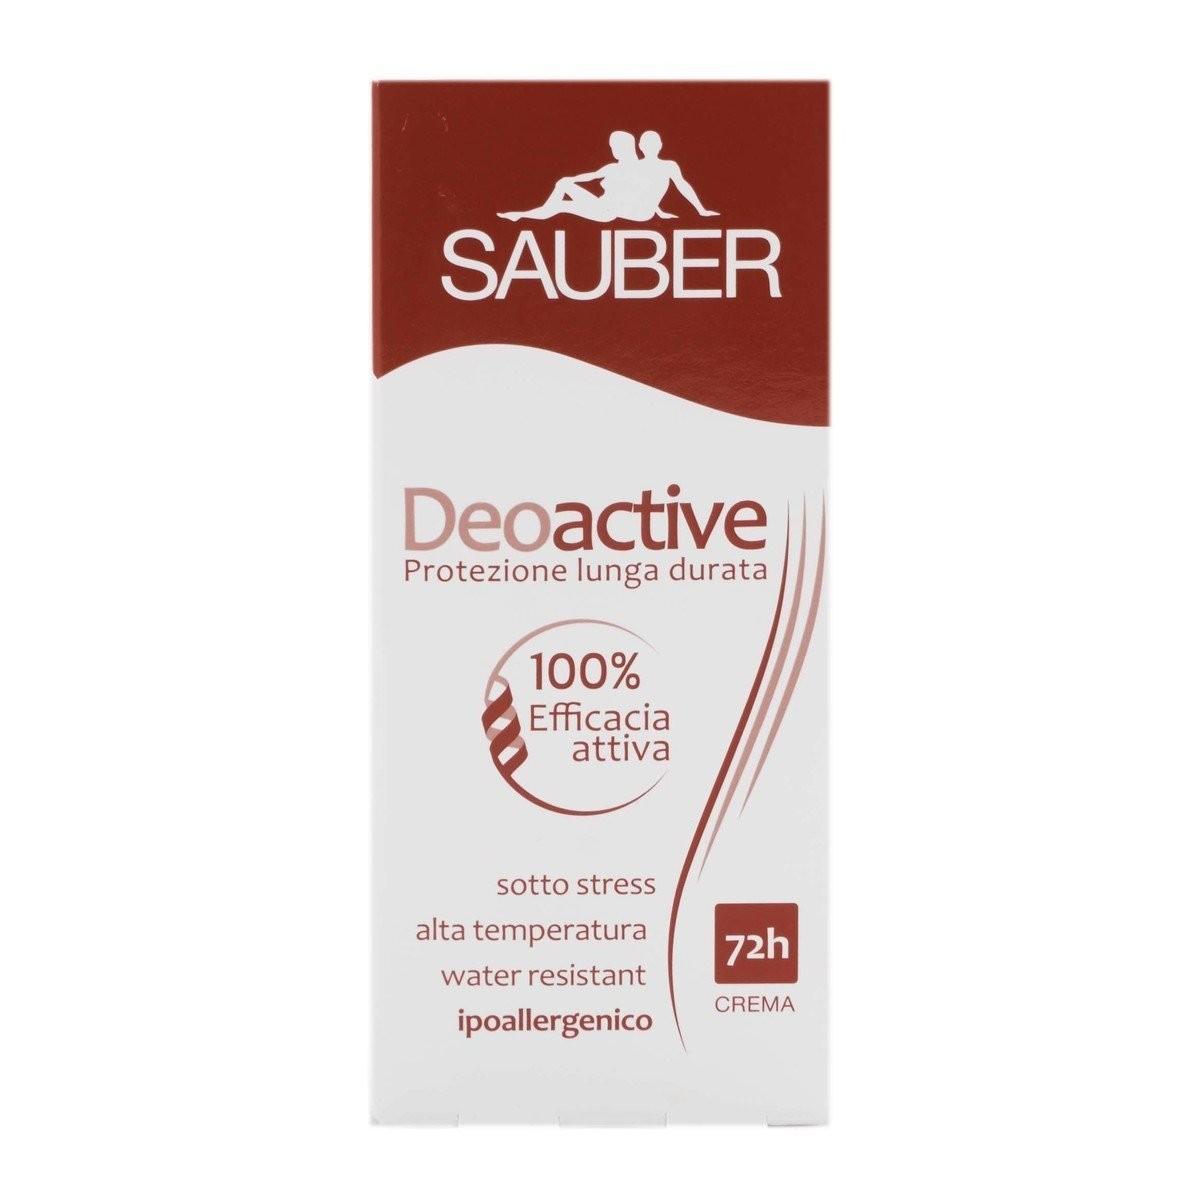 Sauber Deodorante in crema Deoactive